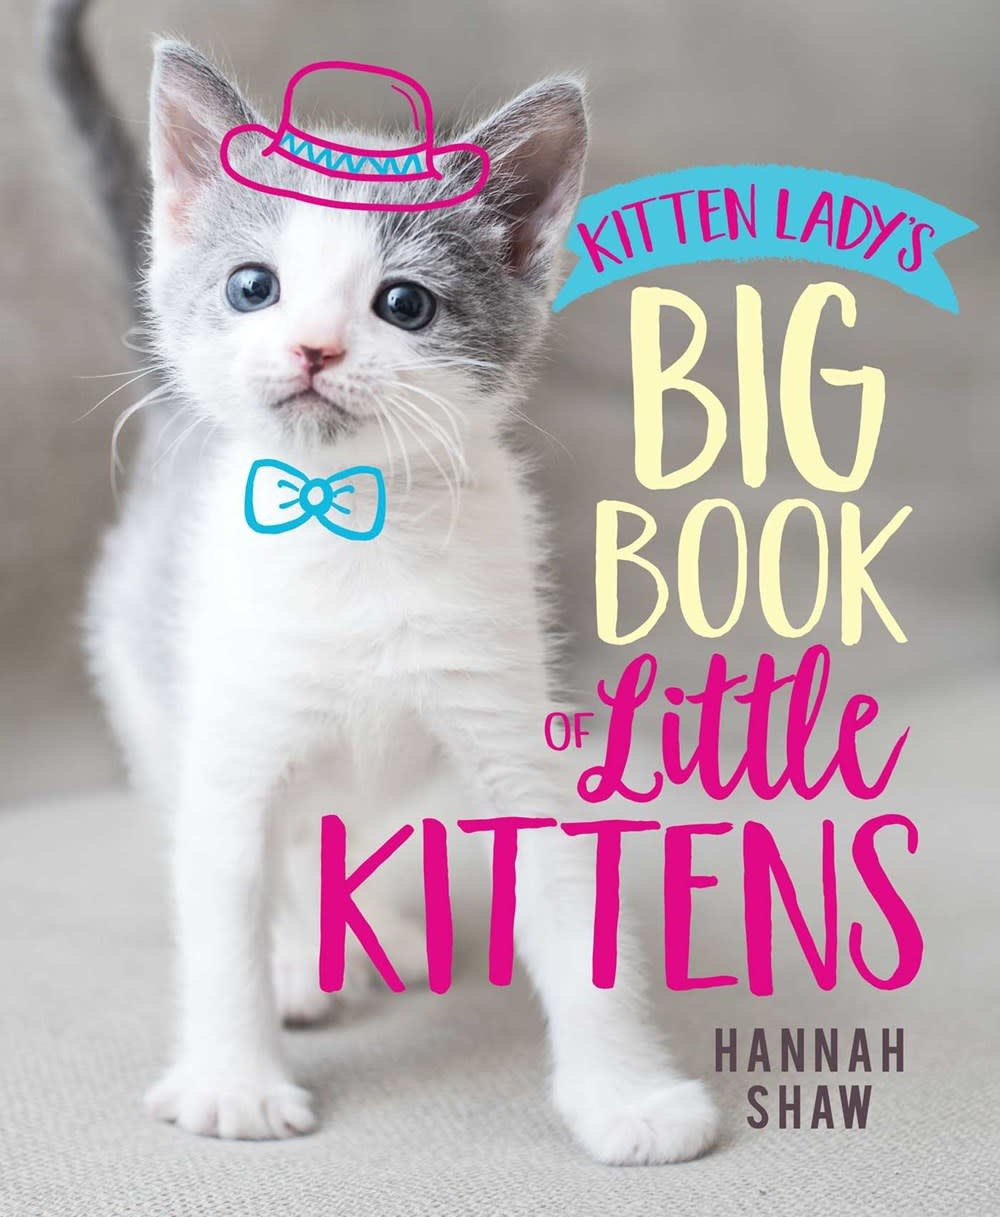 Aladdin Kitten Lady's Big Book of Little Kittens